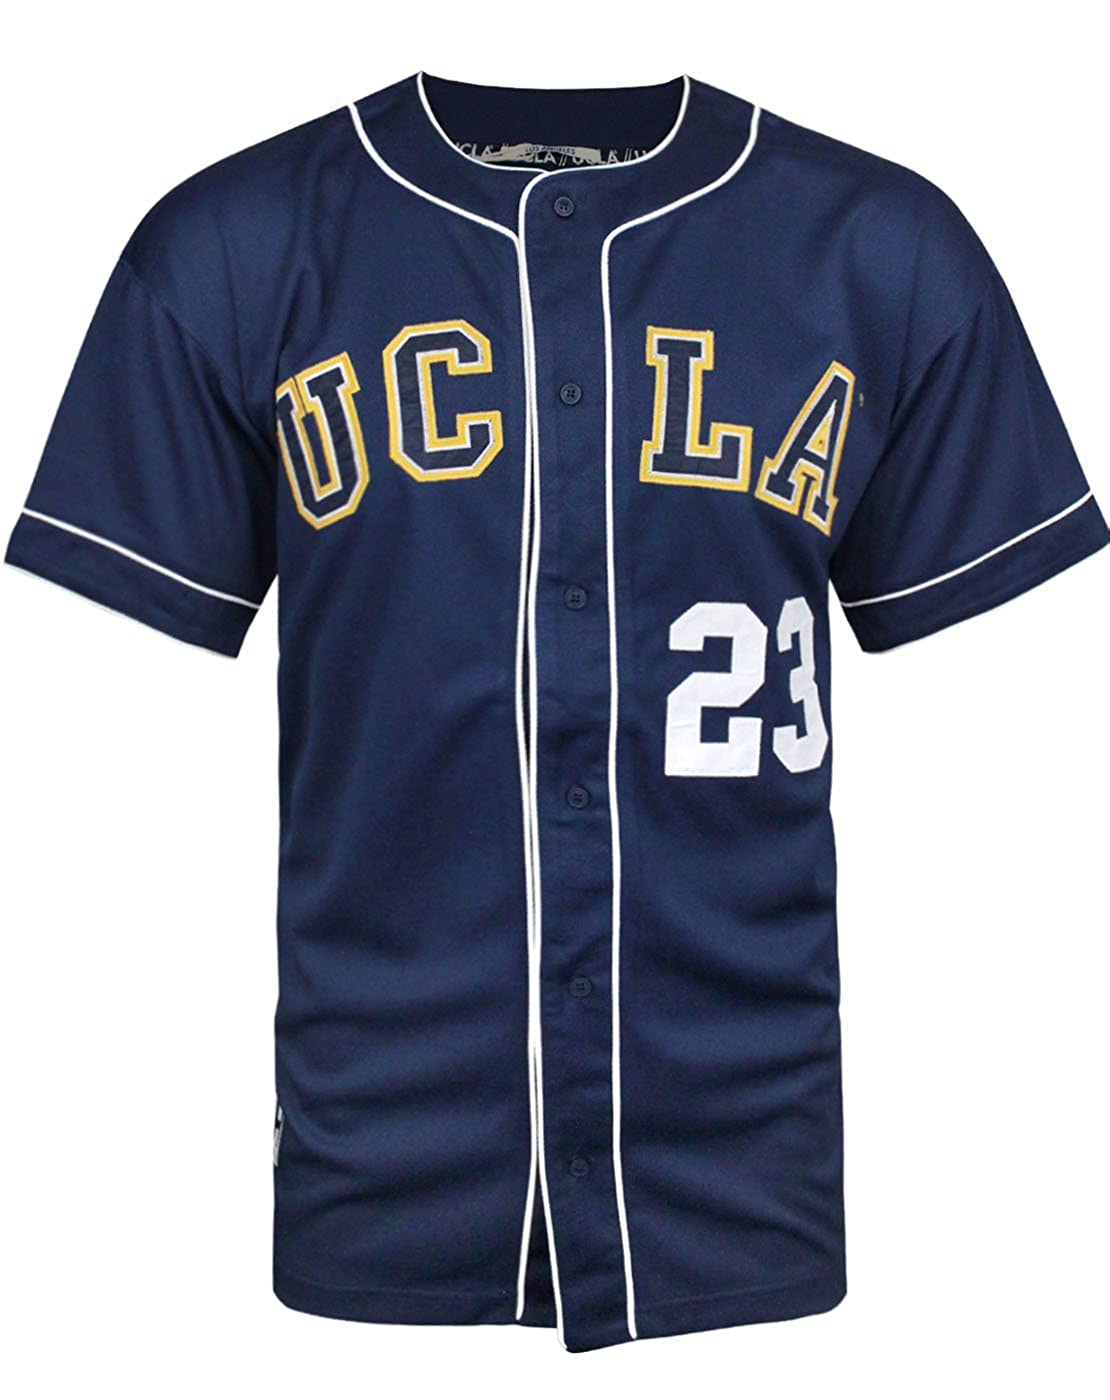 new product 5fe8a 2c077 Amazon.com: Official UCLA 23 Men's Baseball Shirt (S): Clothing